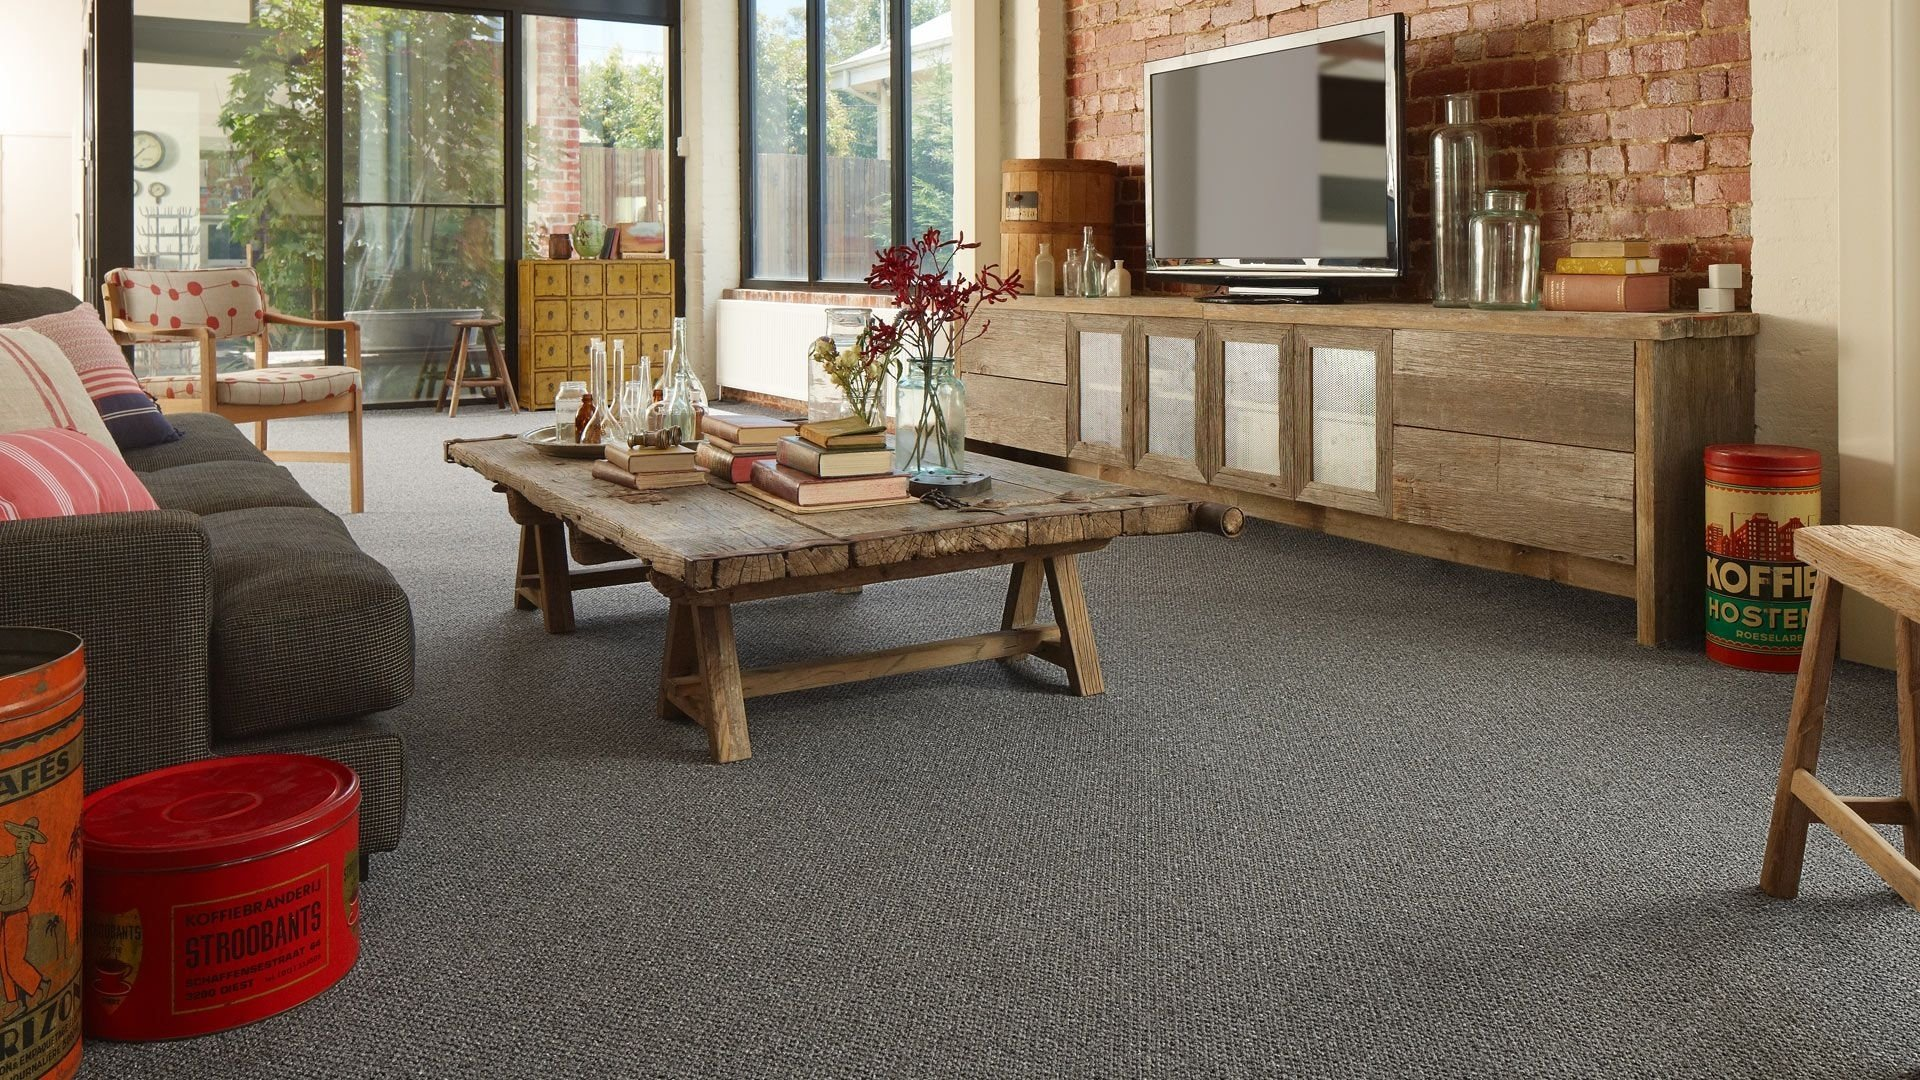 10 Fashionable Wall To Wall Carpet Ideas dark grey luxury carpet home decor loversiq carpet colors 2020